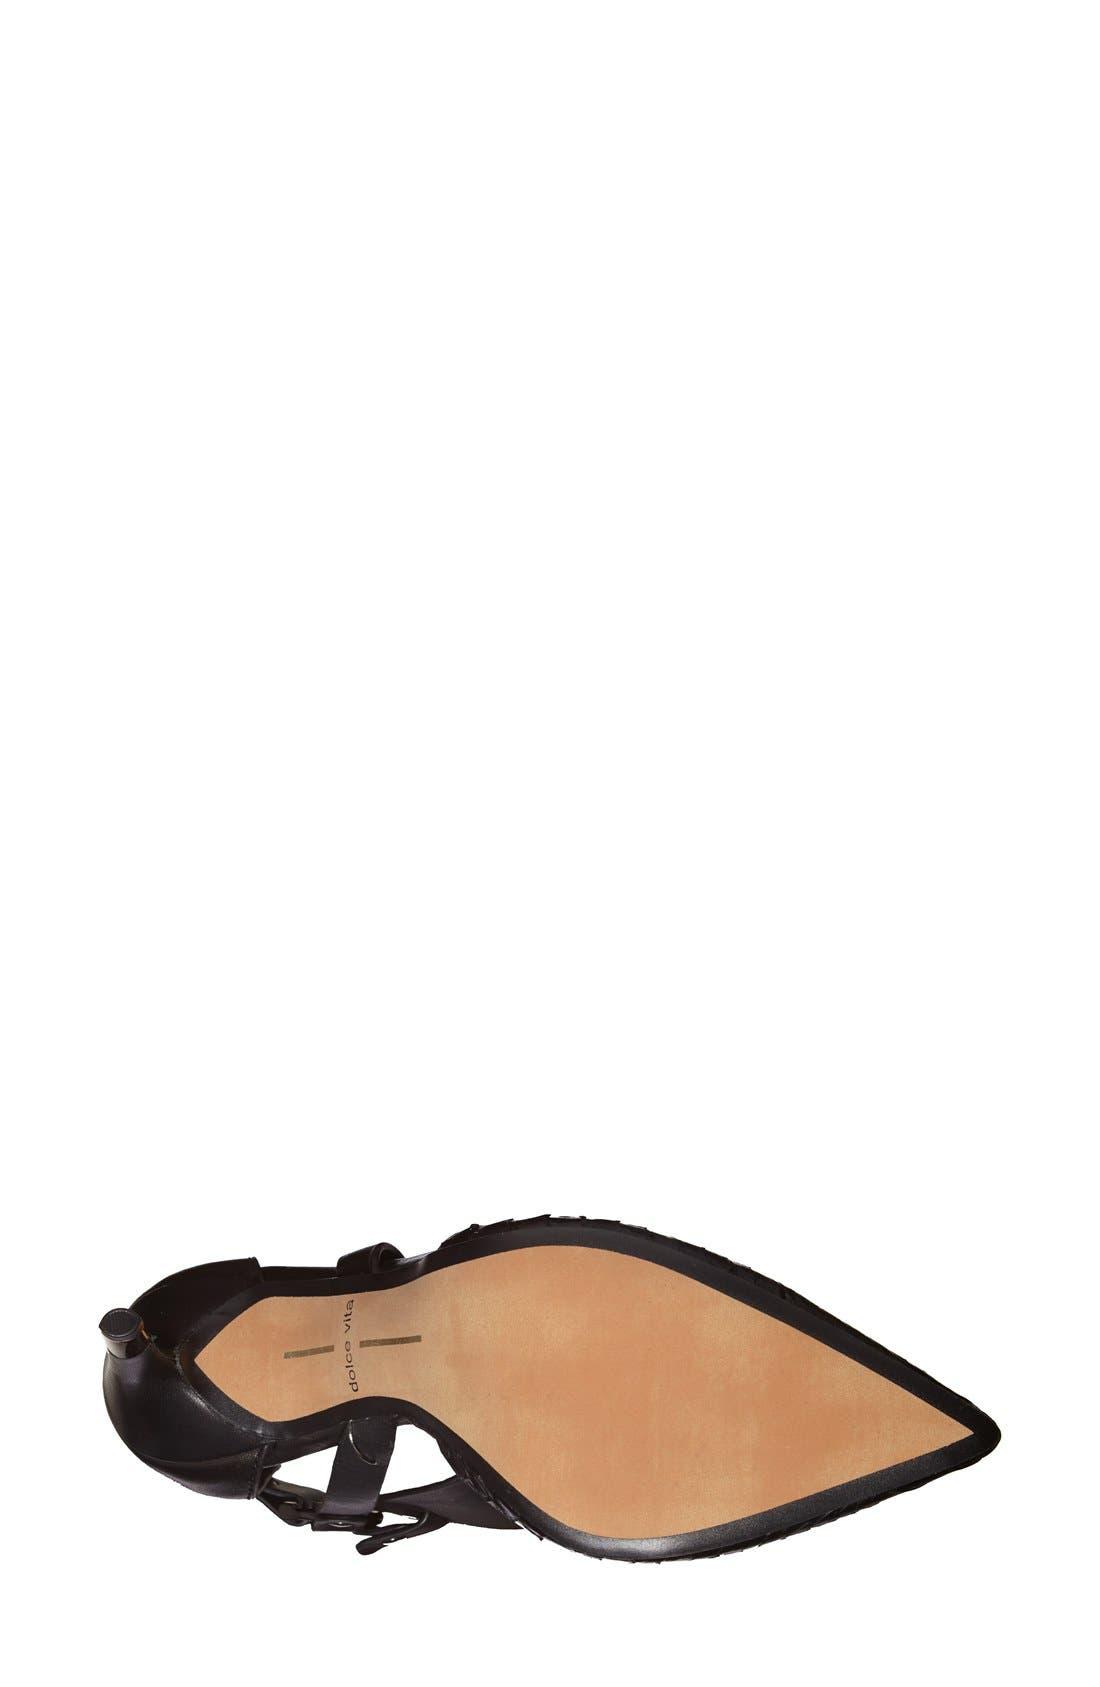 Alternate Image 4  - Dolce Vita 'Knoxx' Leather Pump (Women)